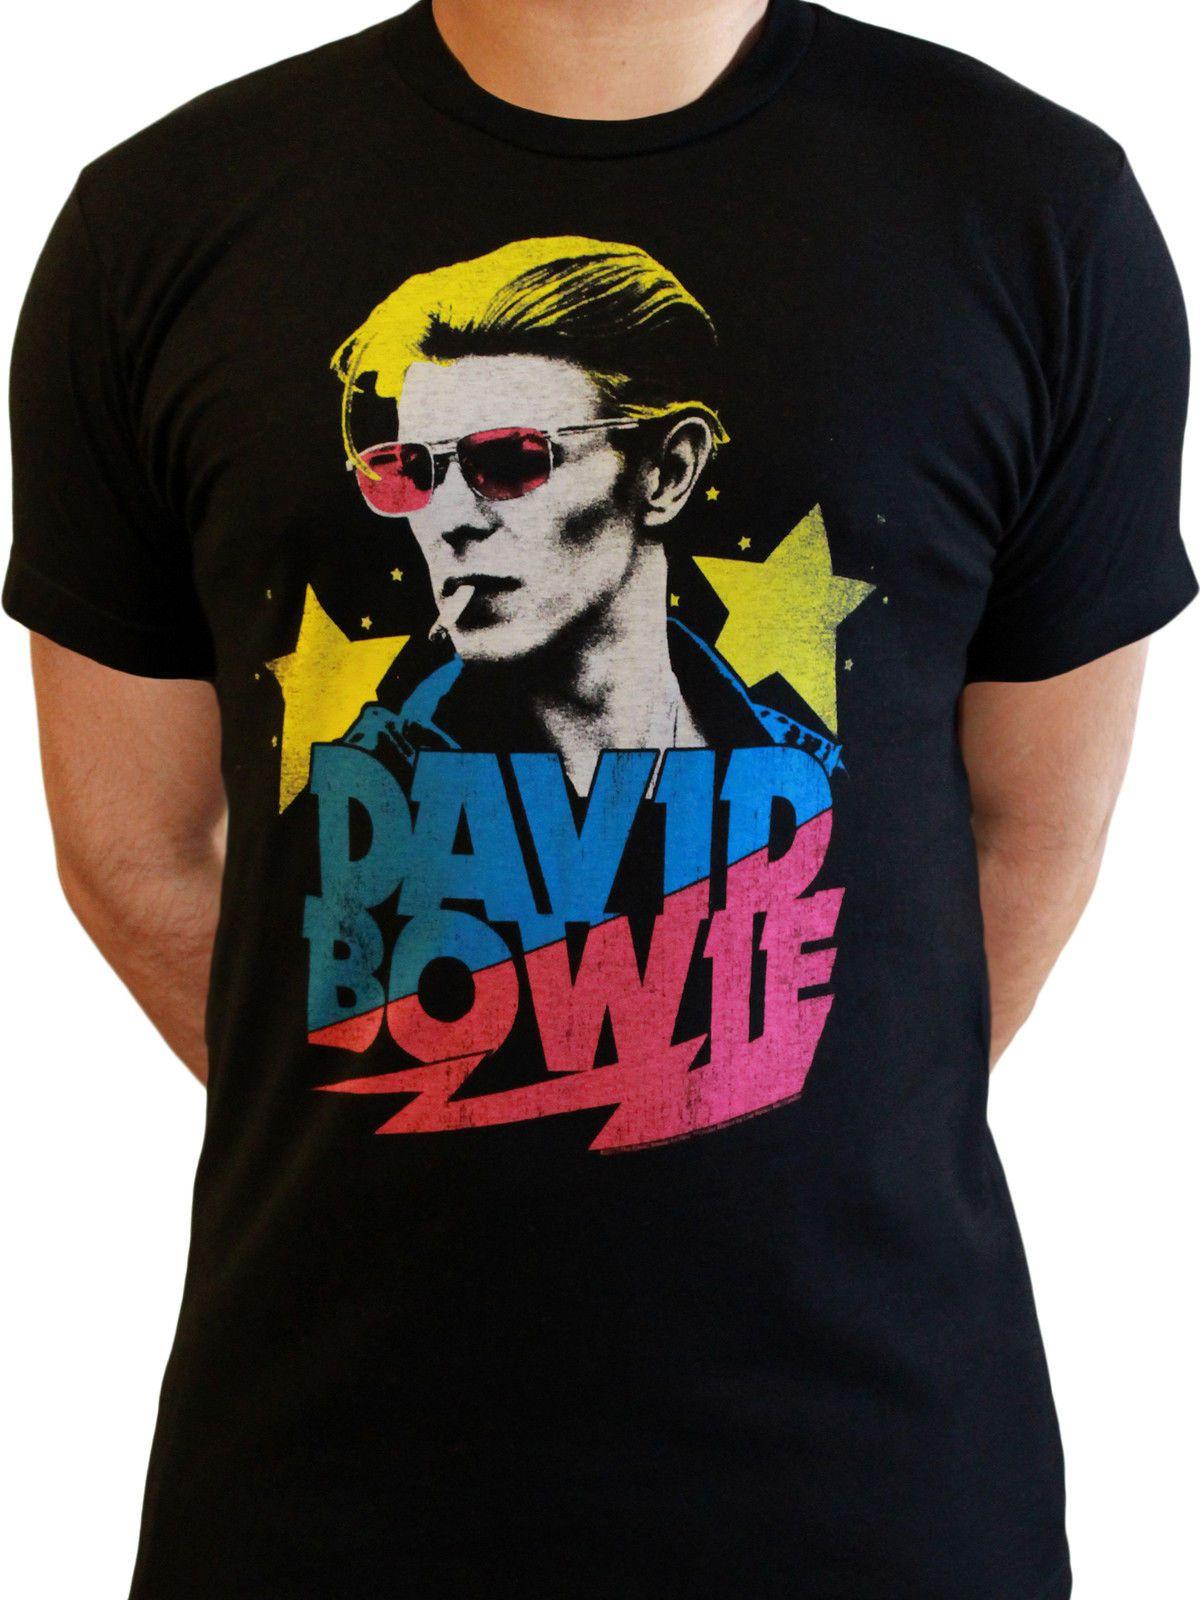 d6ec737b8 David Bowie Slash Starman Official Rock Pop Music Negro Hombres camiseta  denim ropa camiseta camiseta